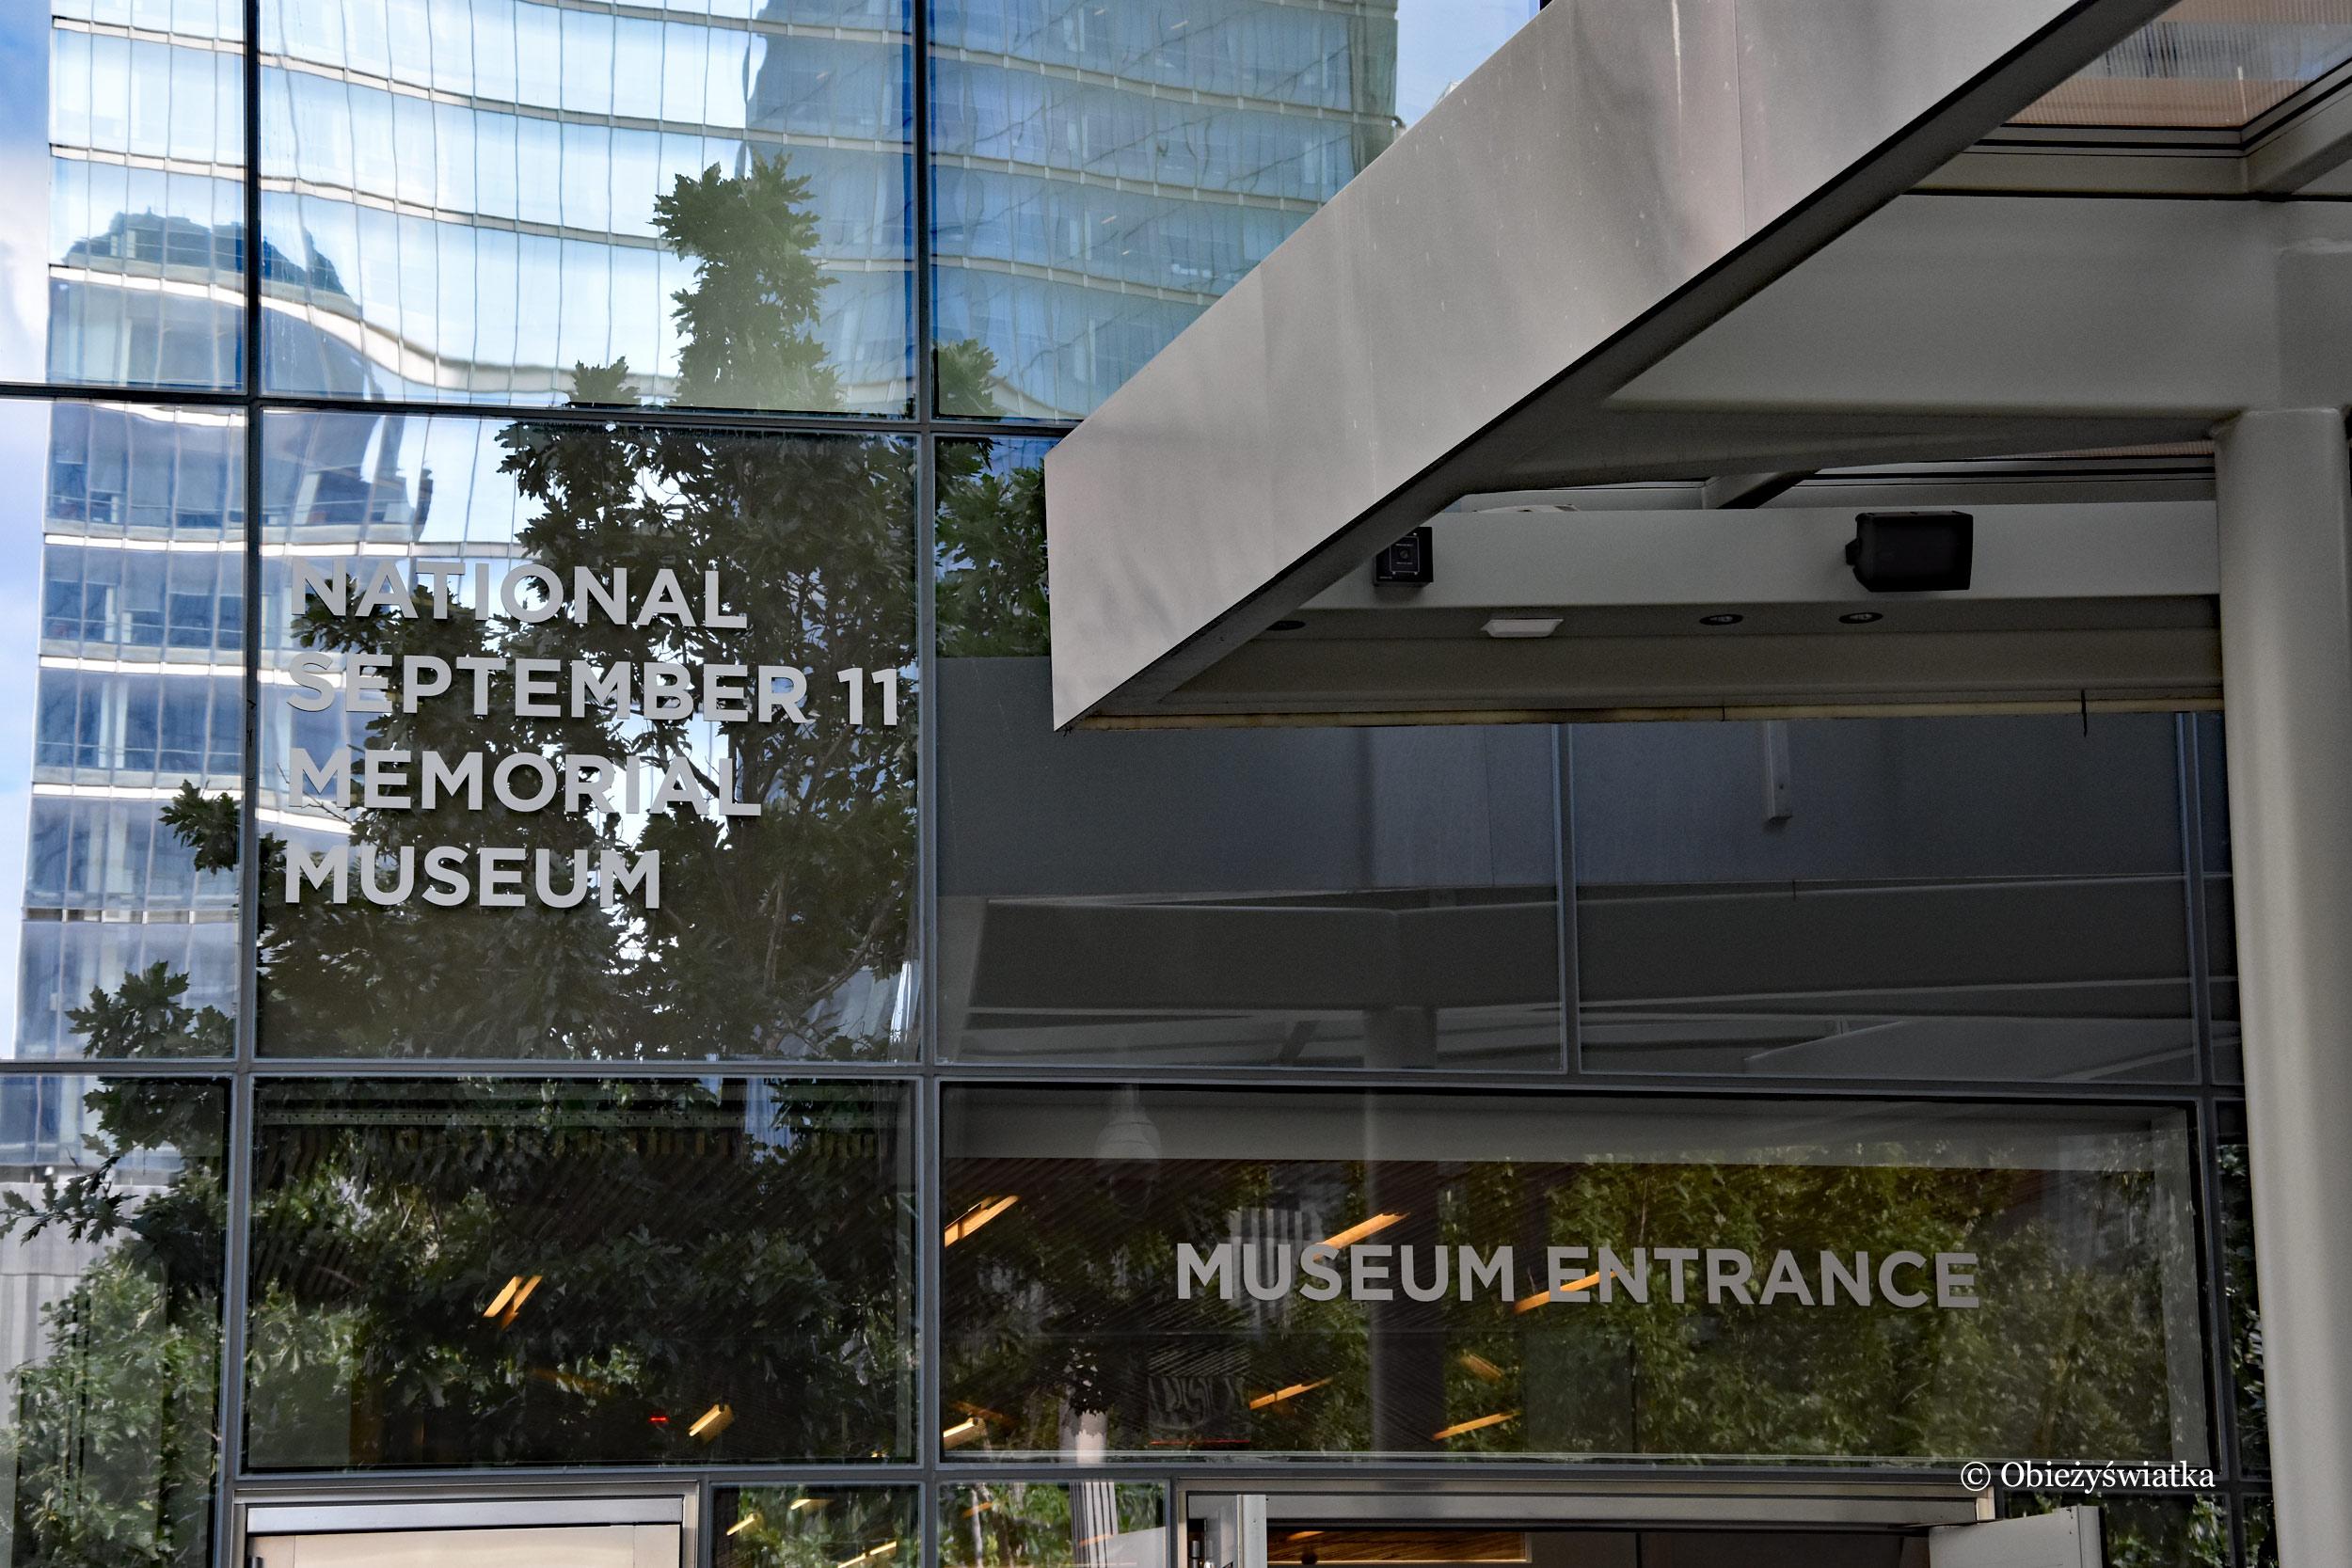 National Memorial September 11, NYC